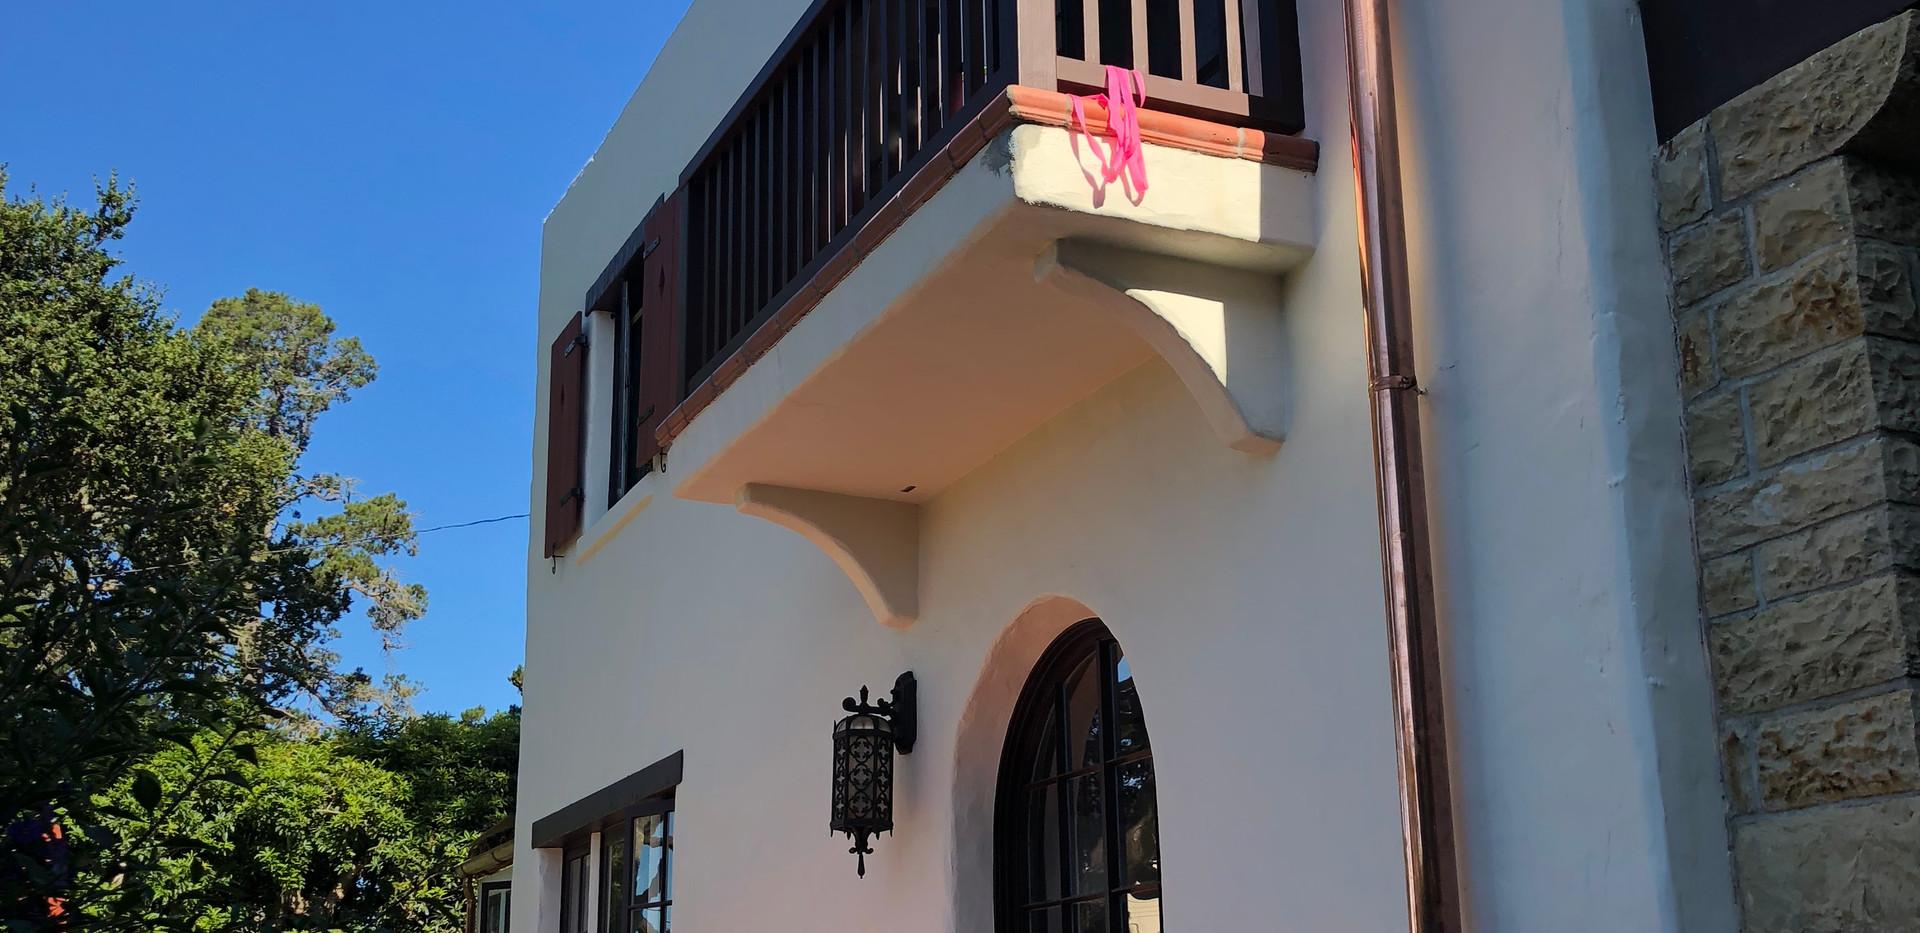 Brads house